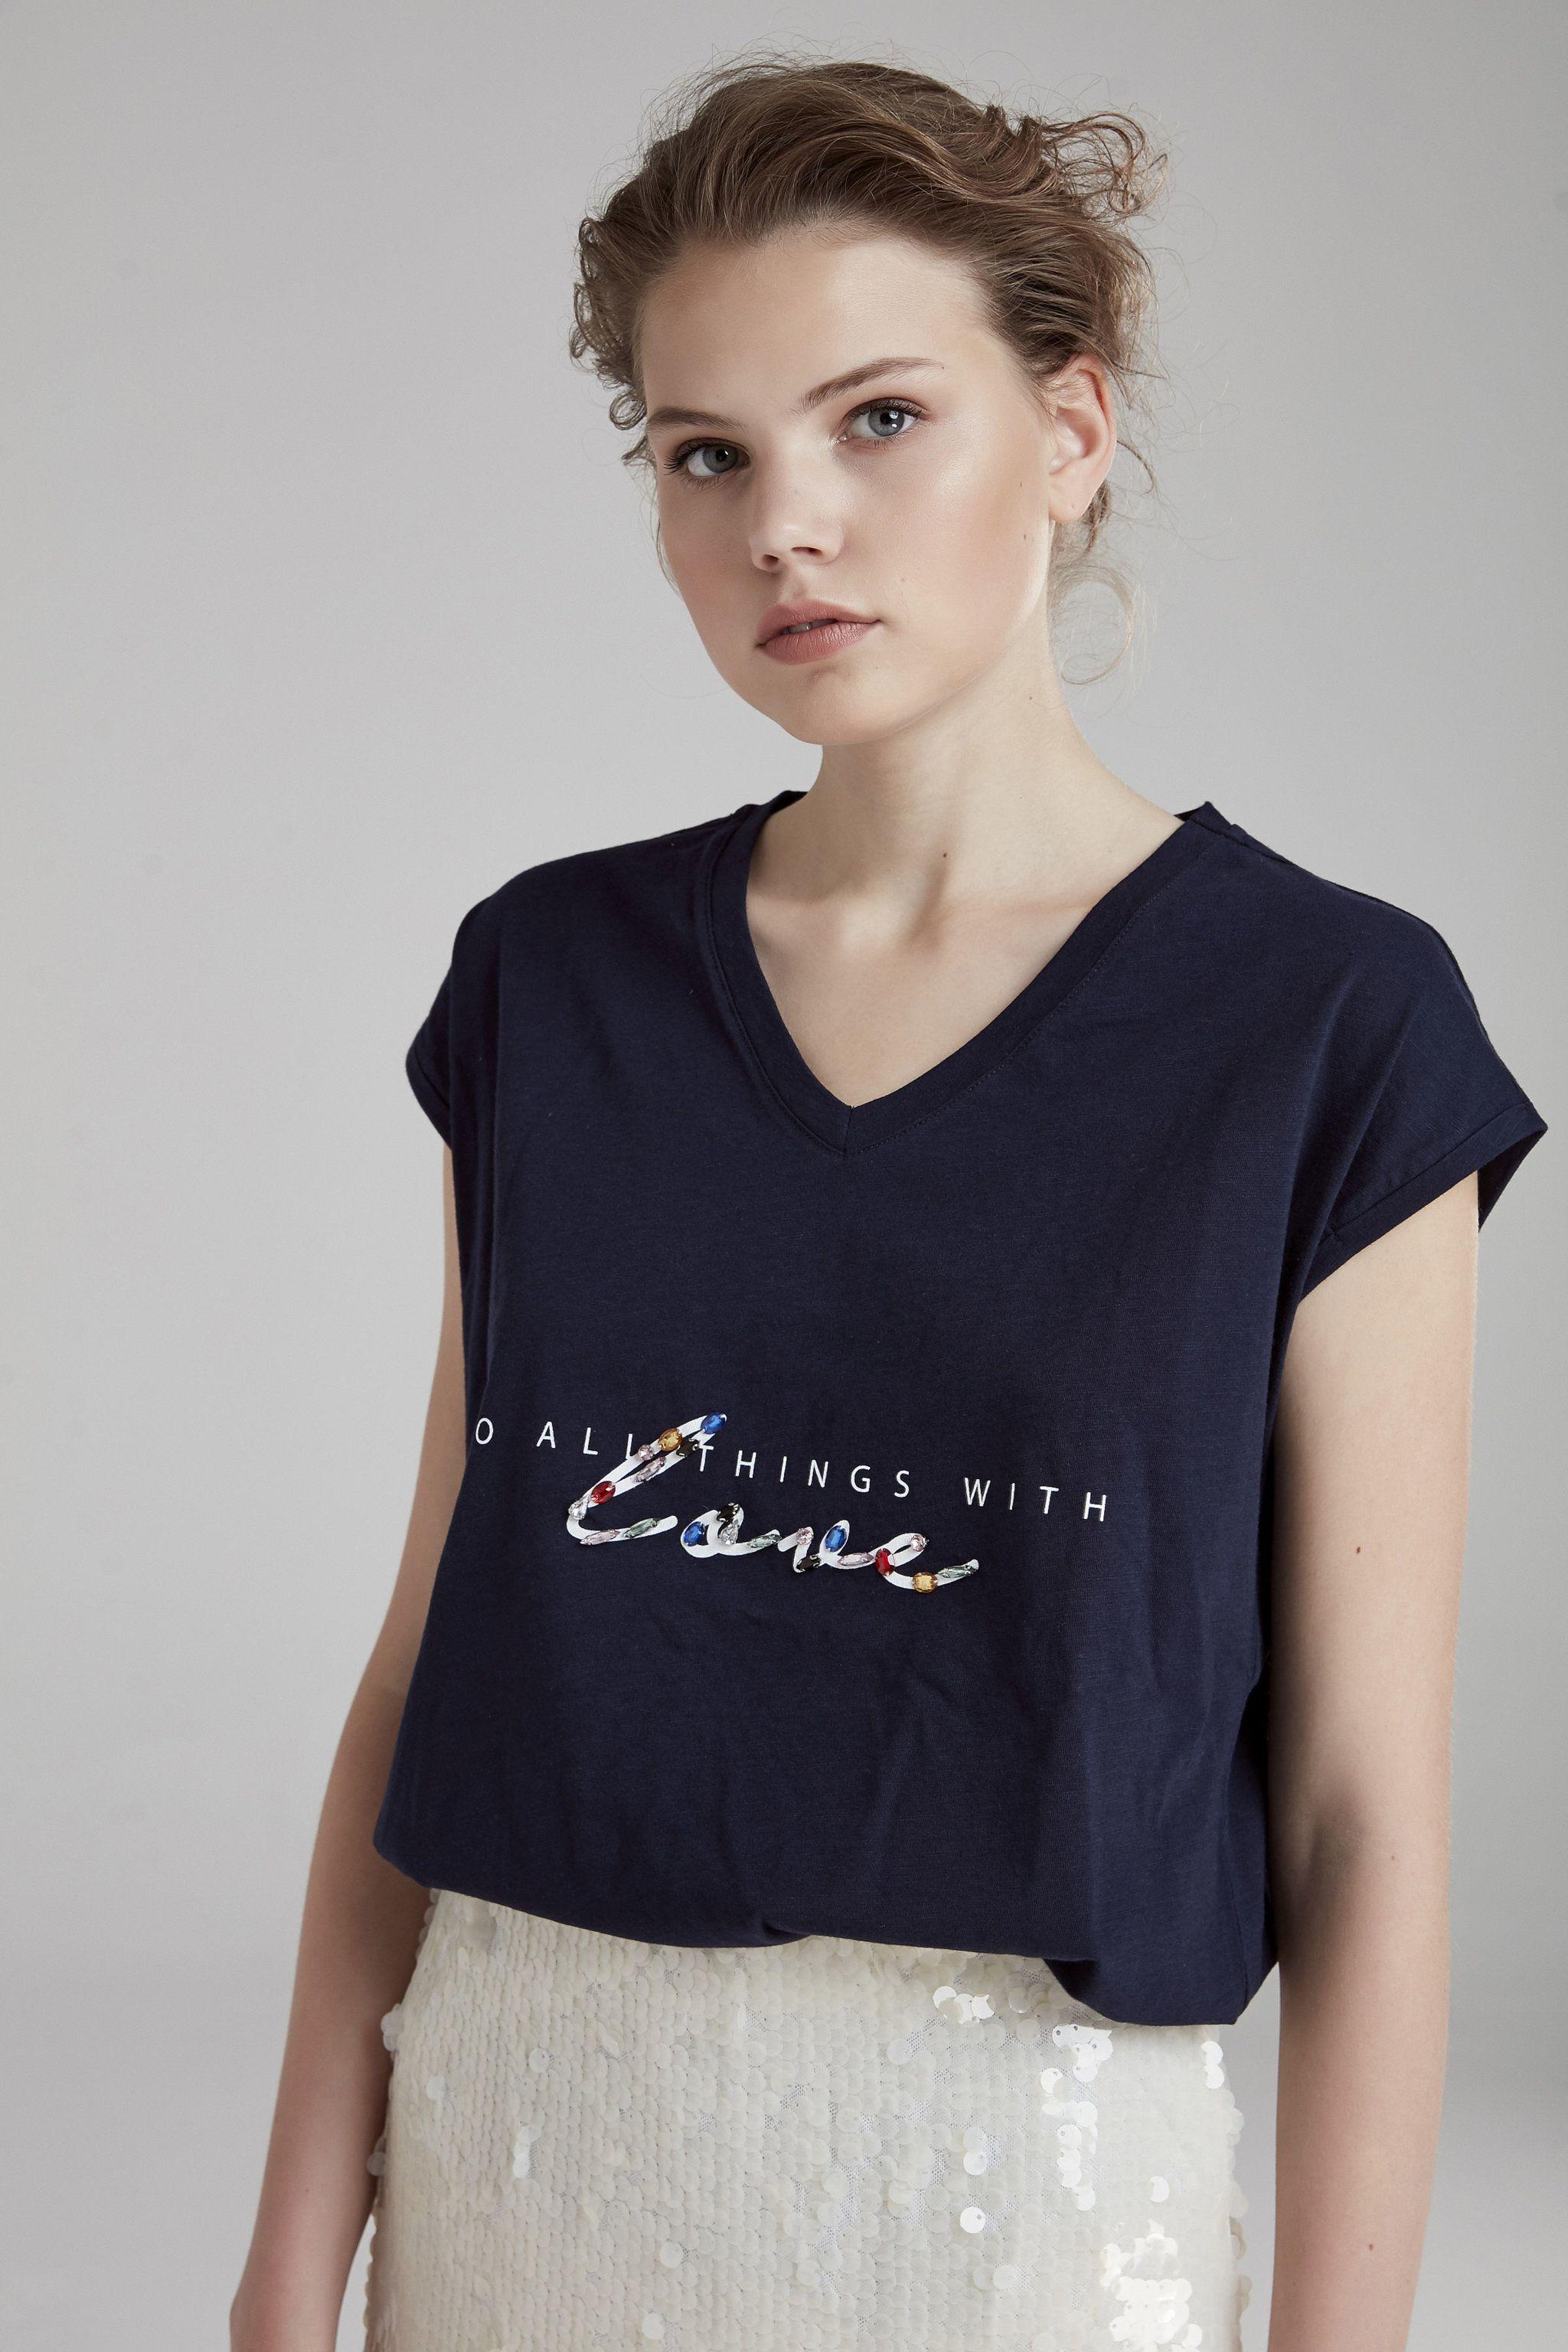 Baskili Tisort Giyim Koleksiyonu Adl Tisort Giyim Butik